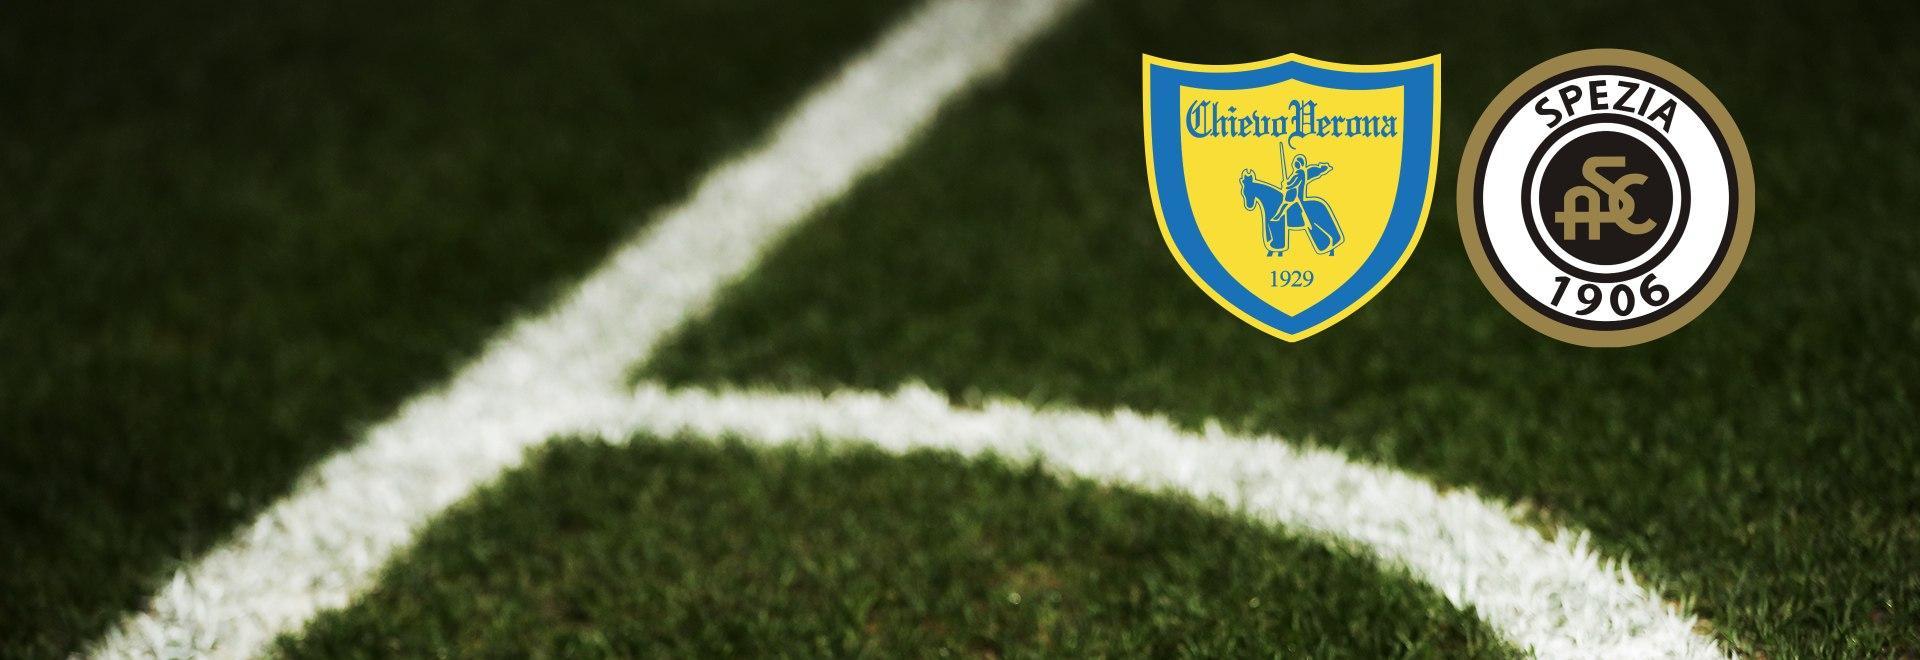 Chievo - Spezia. Playoff Semifinale